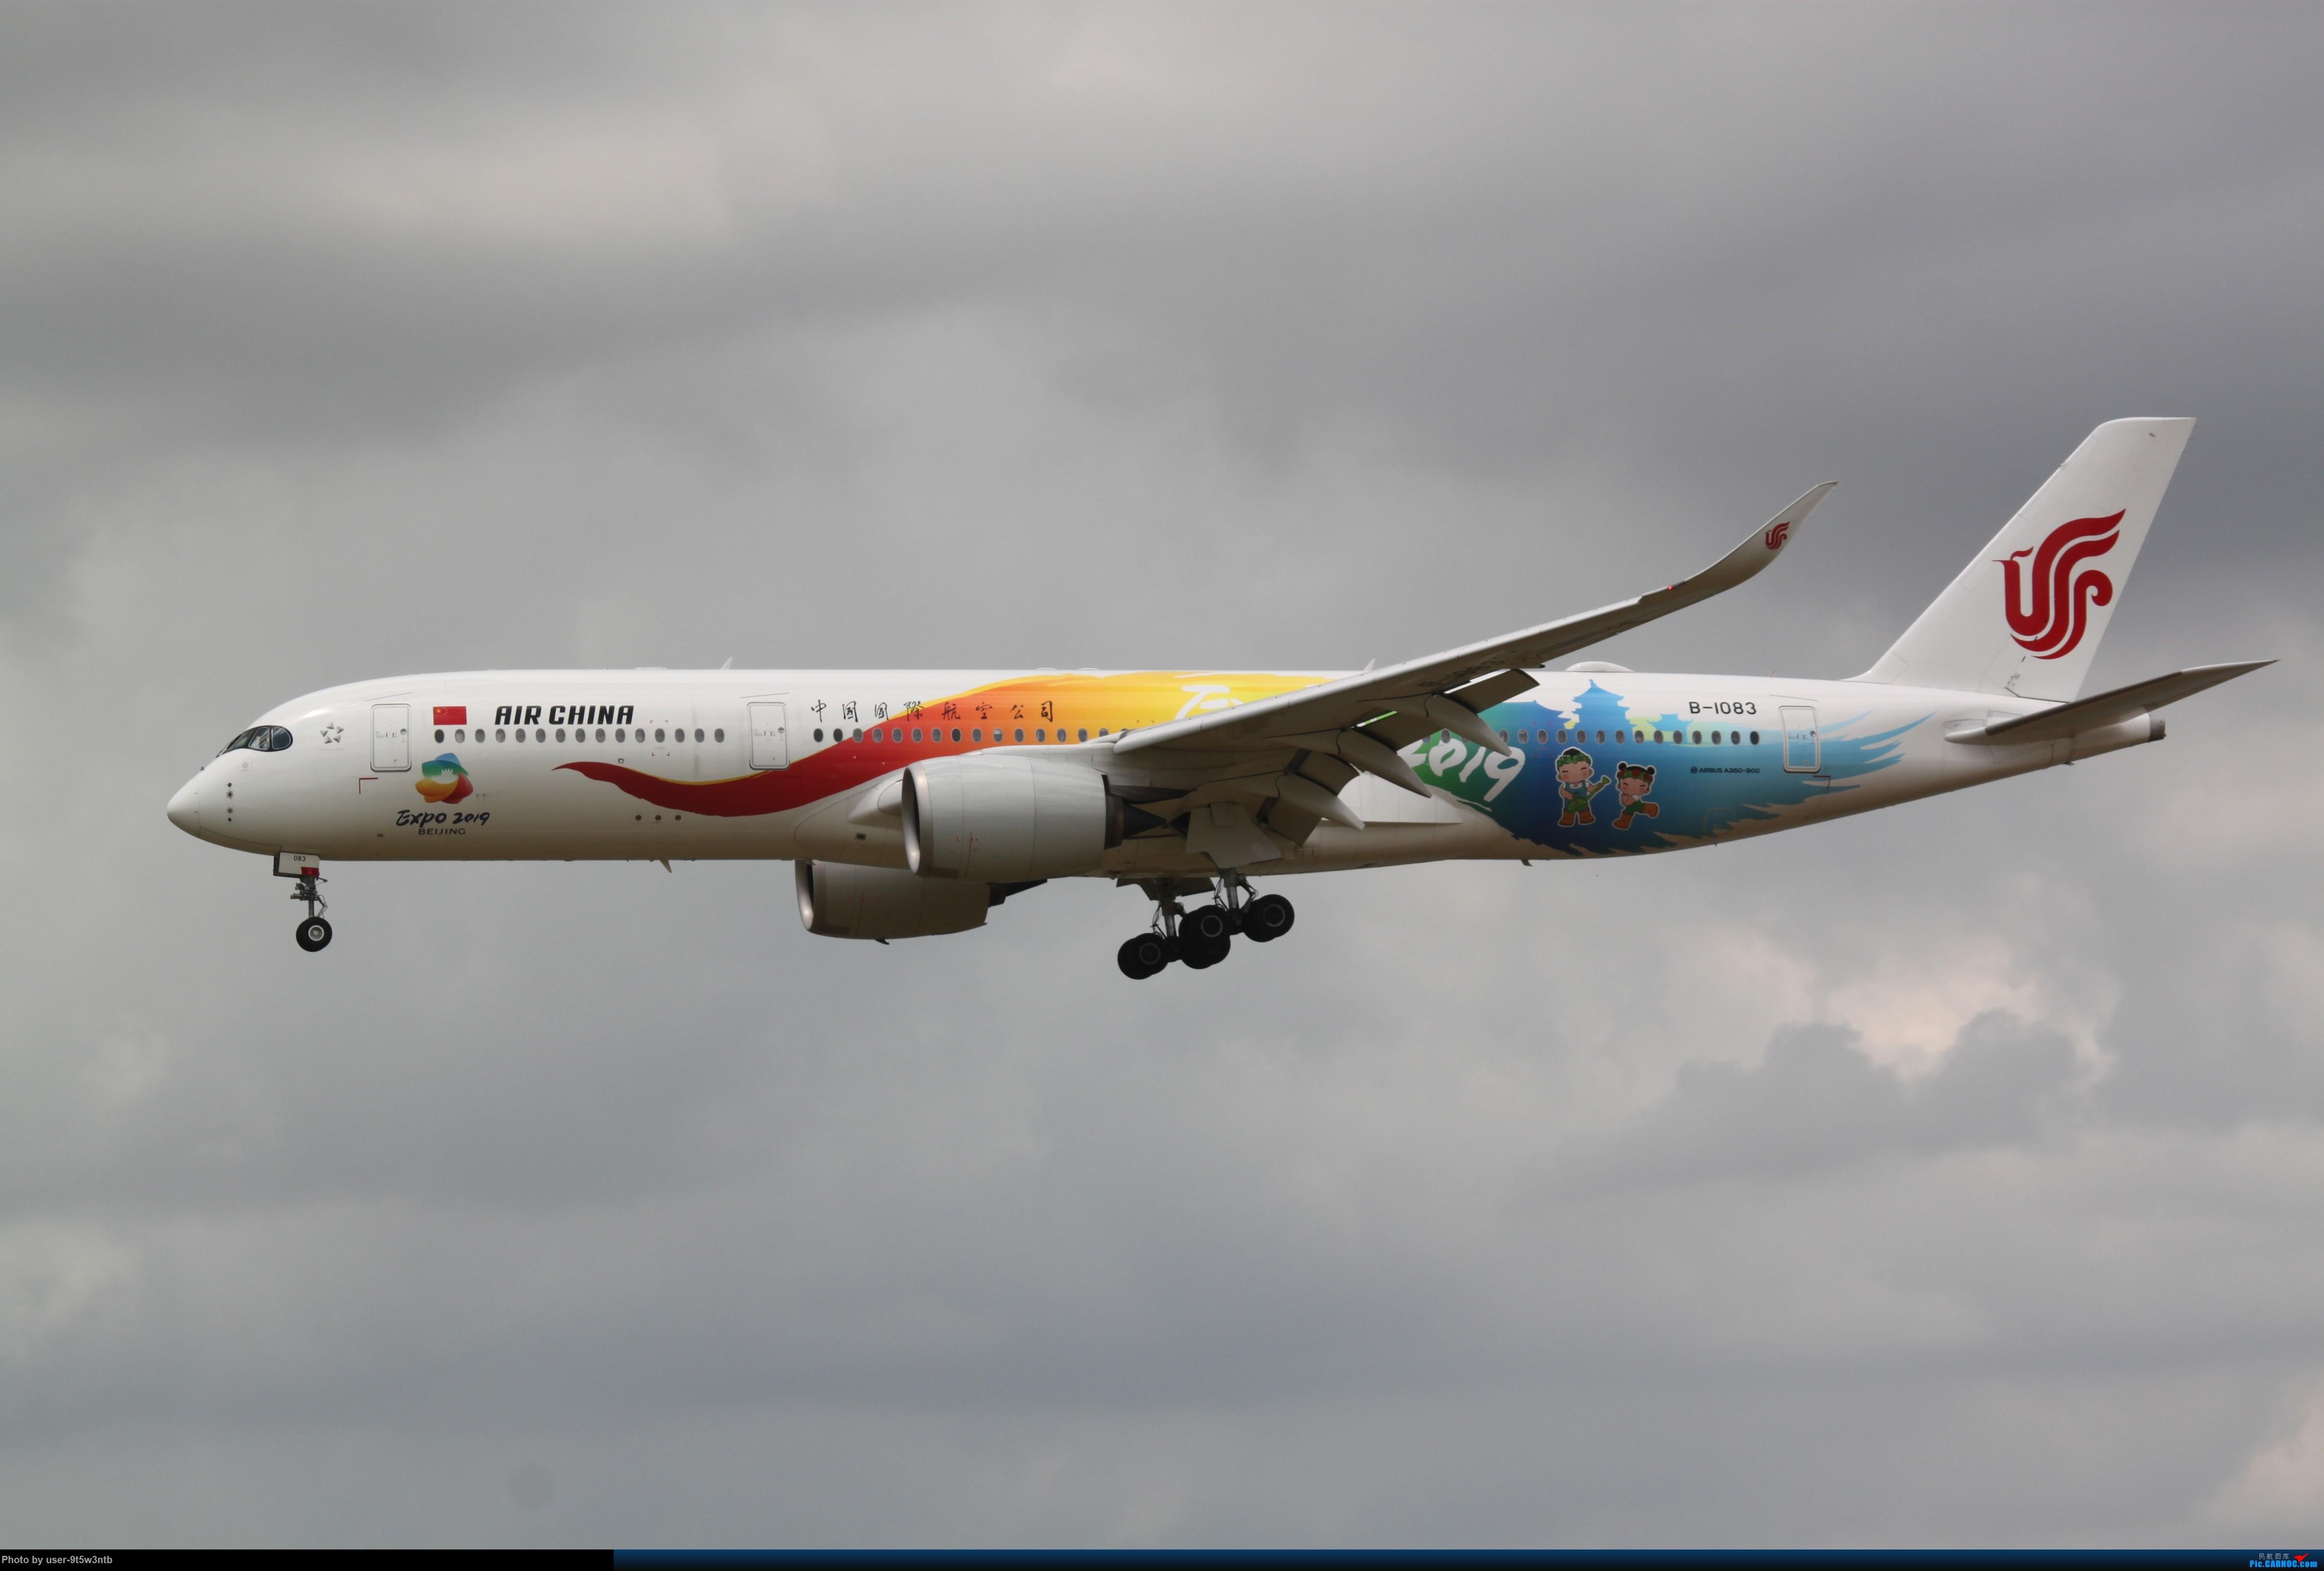 Re:[原创]来整理下最近在虹桥拍到的彩绘机吧~ AIRBUS A350-900 B-1083 中国上海虹桥国际机场